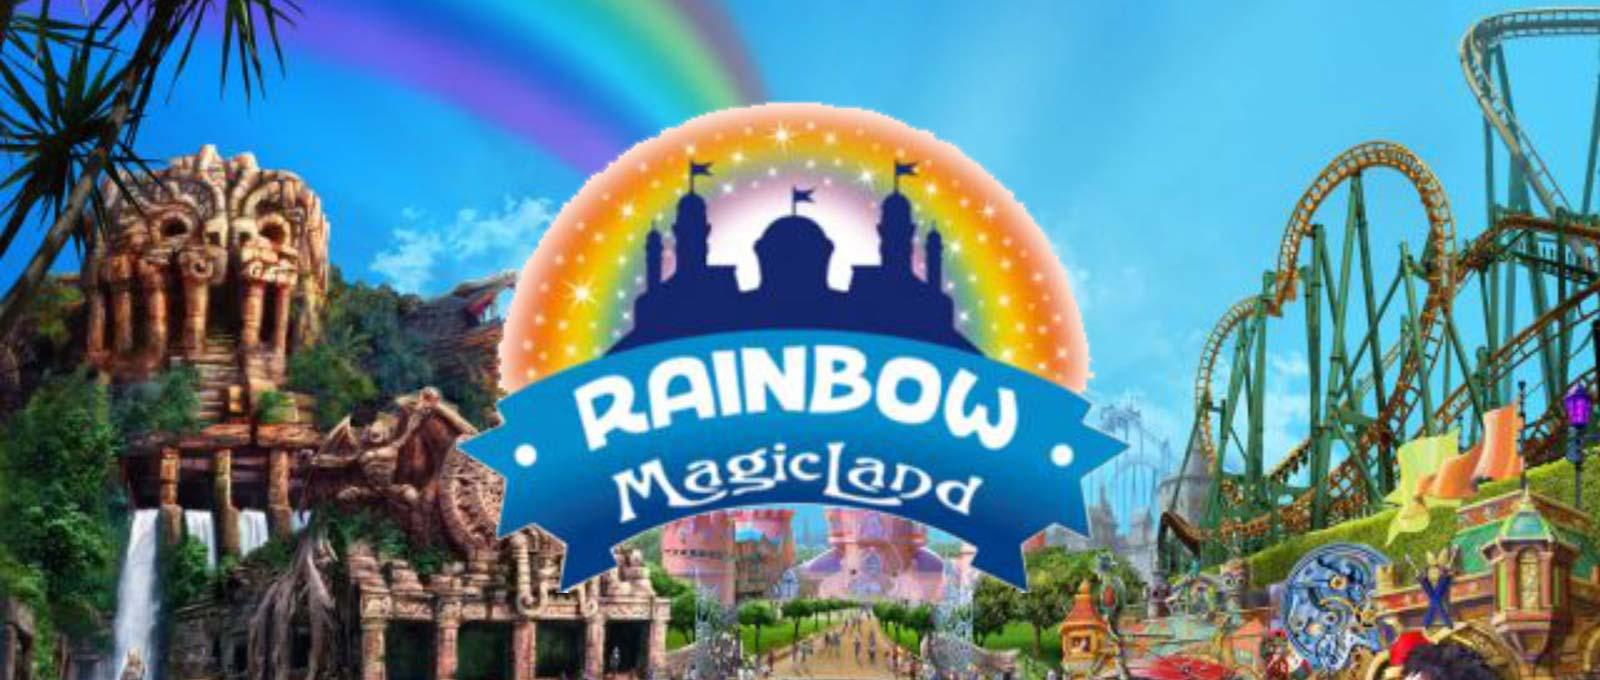 Raimbow MagicLand